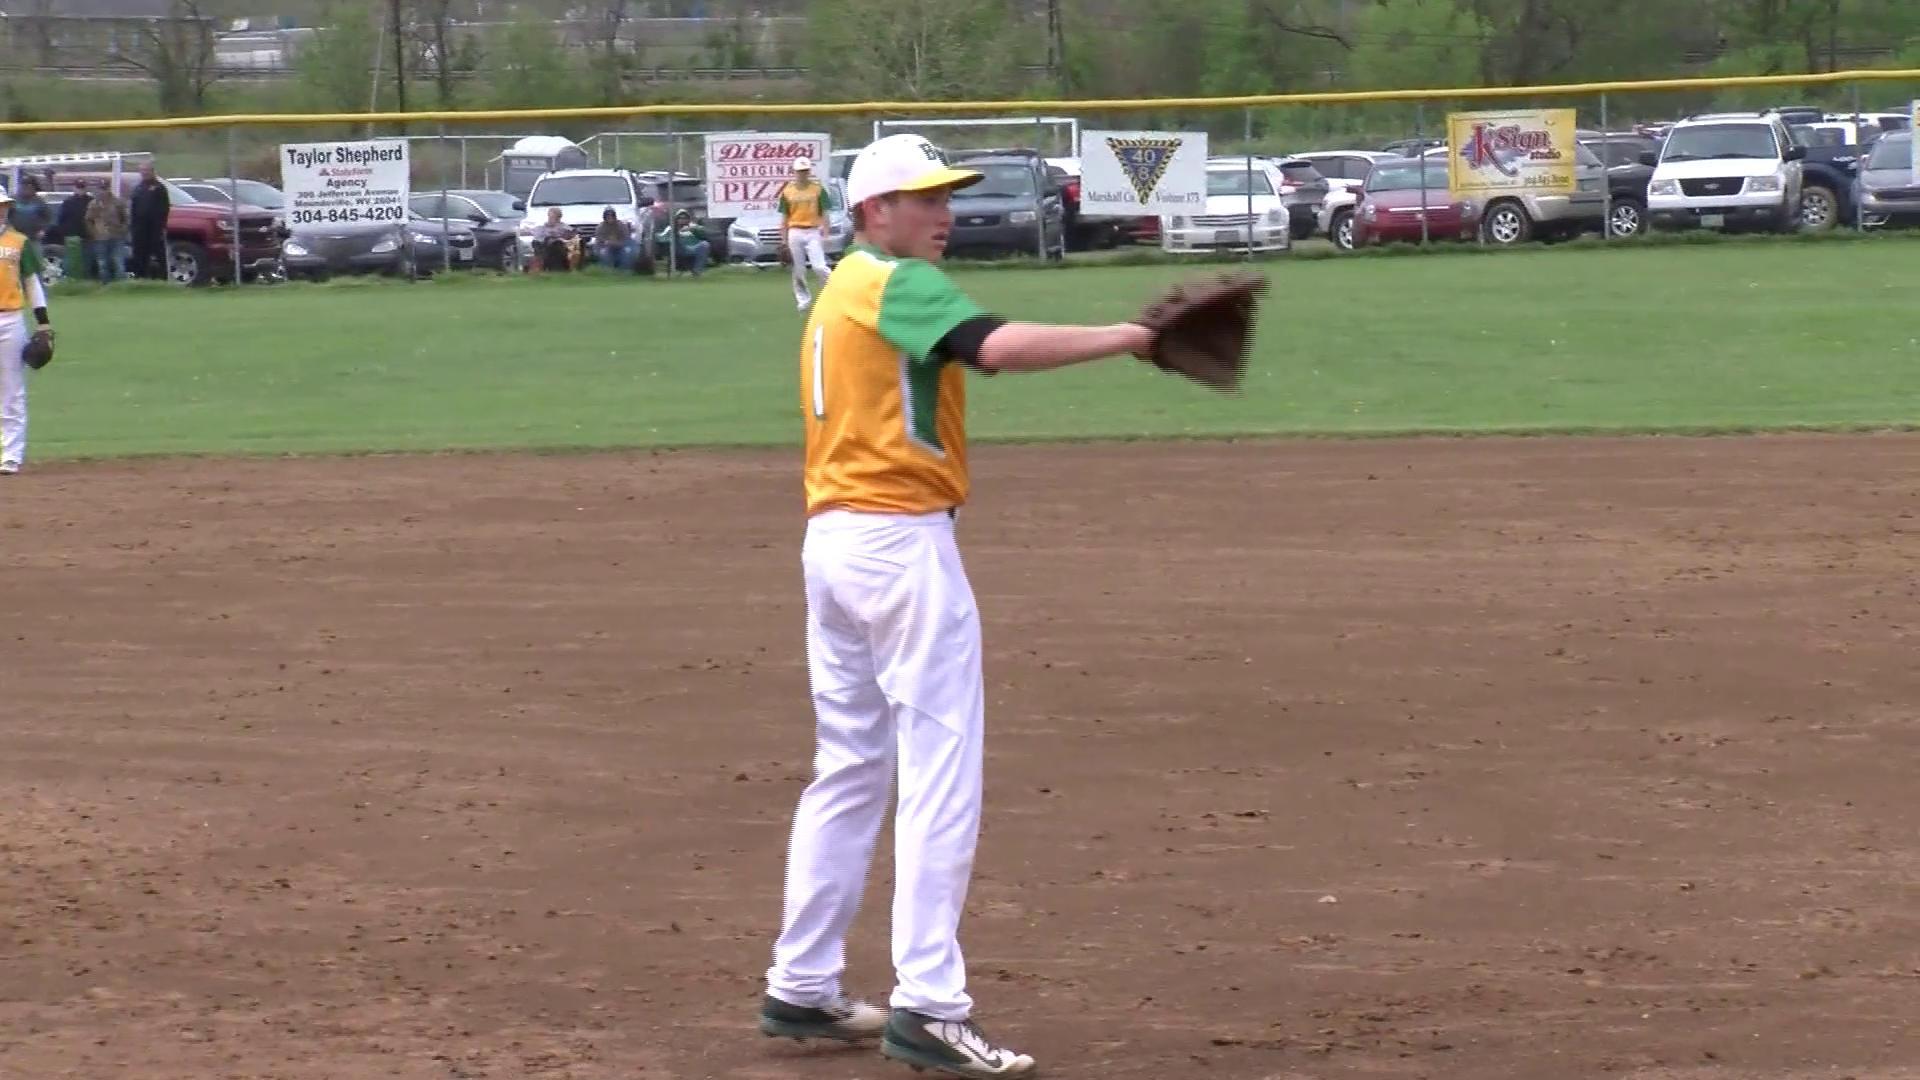 4.22.17 Highlights - Bishop Donahue advances to OVAC 1A baseball final